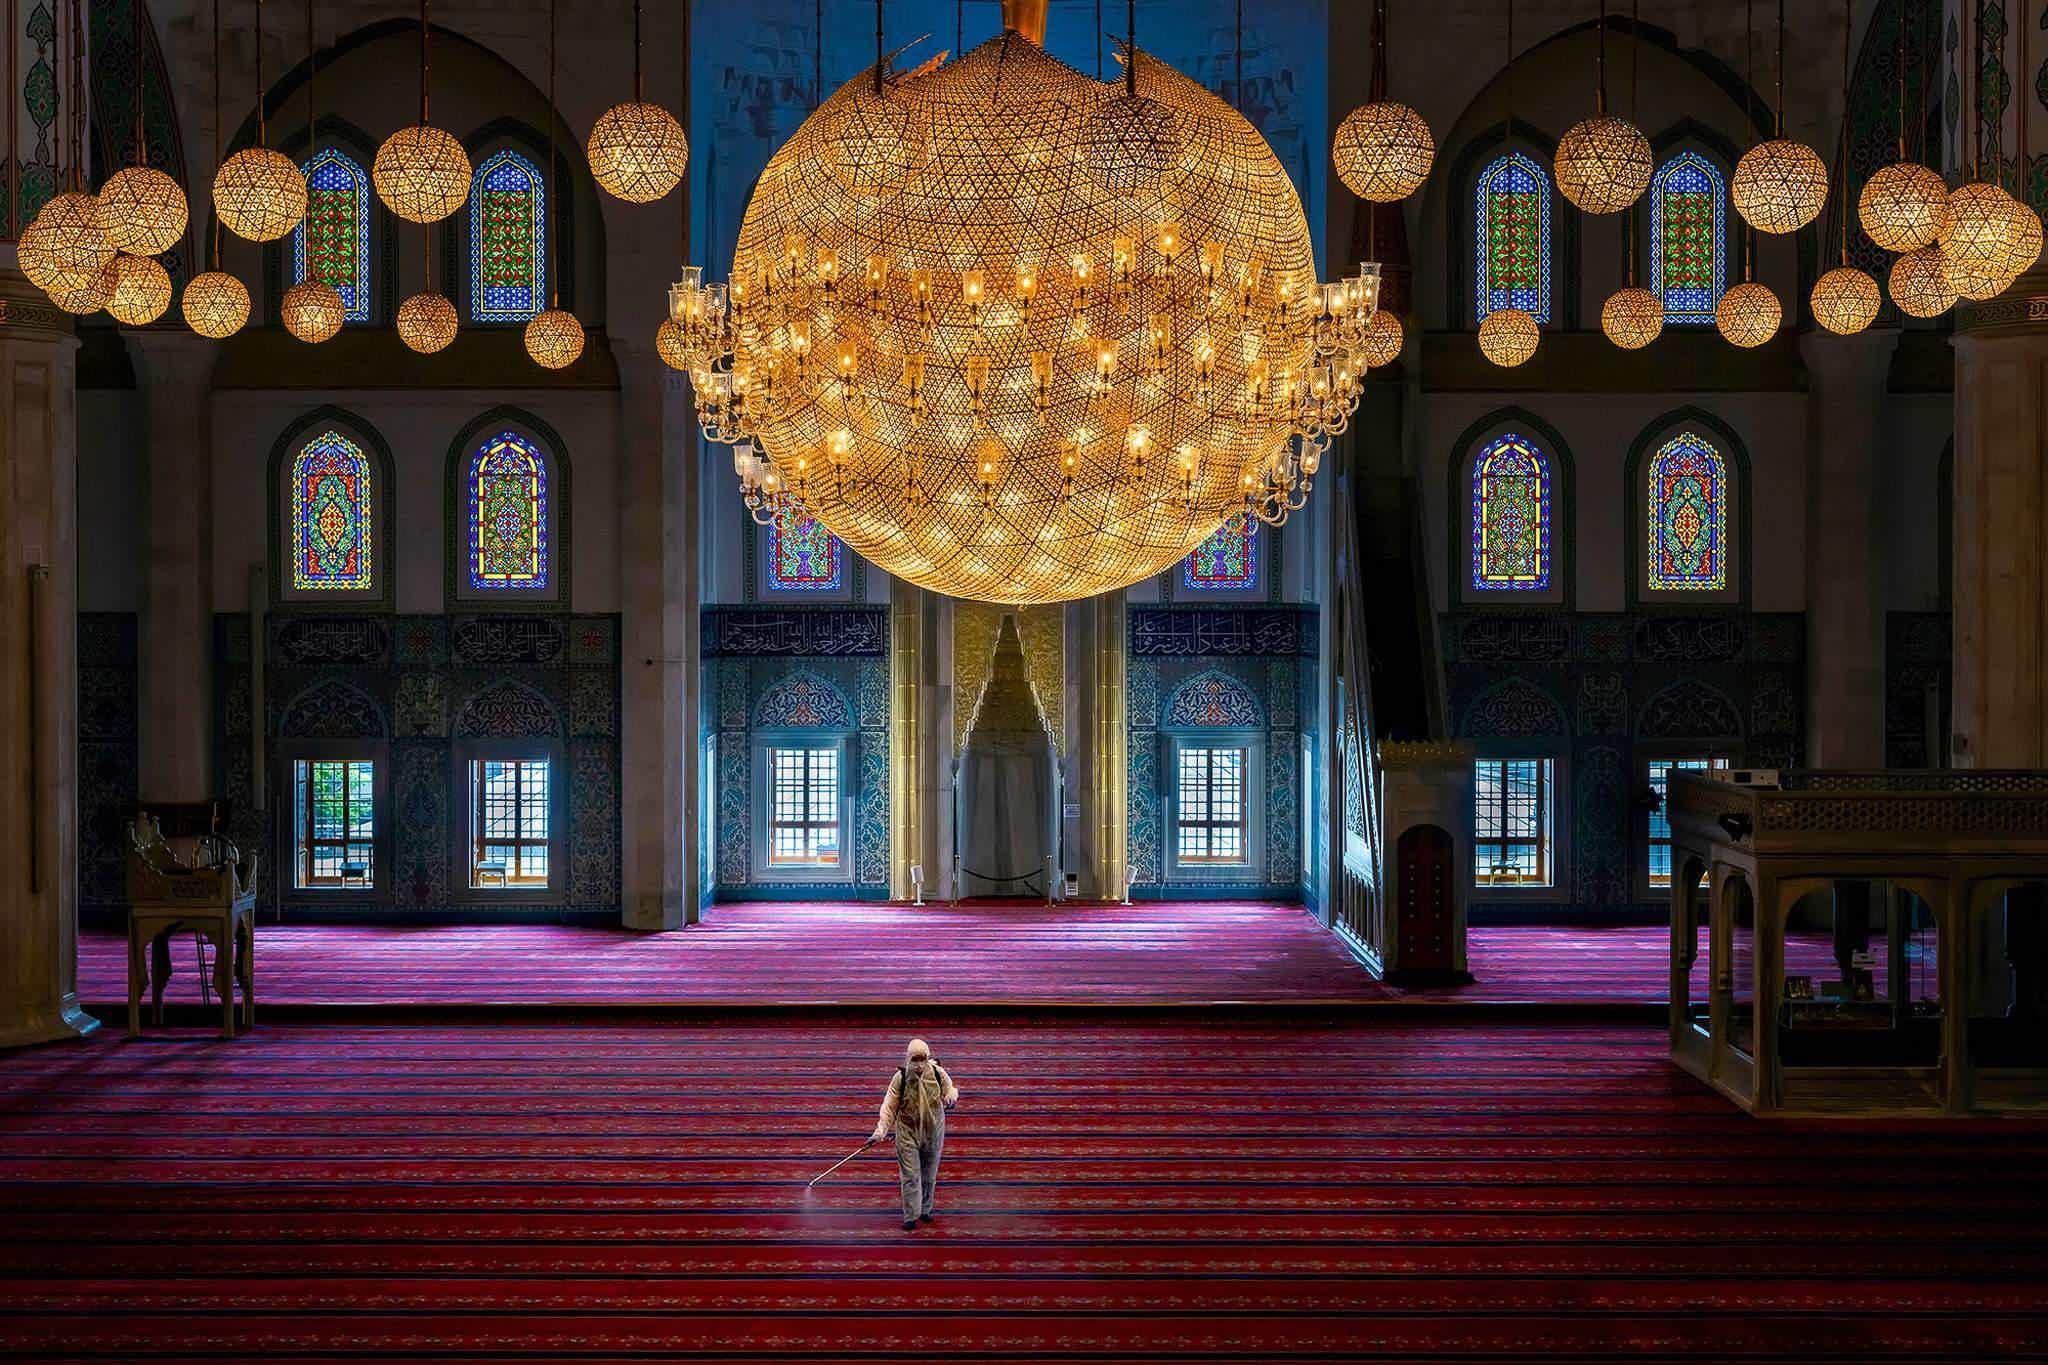 """Мөргөлийн өмнө"", International Photography Awards/F. Dilek Uyar"